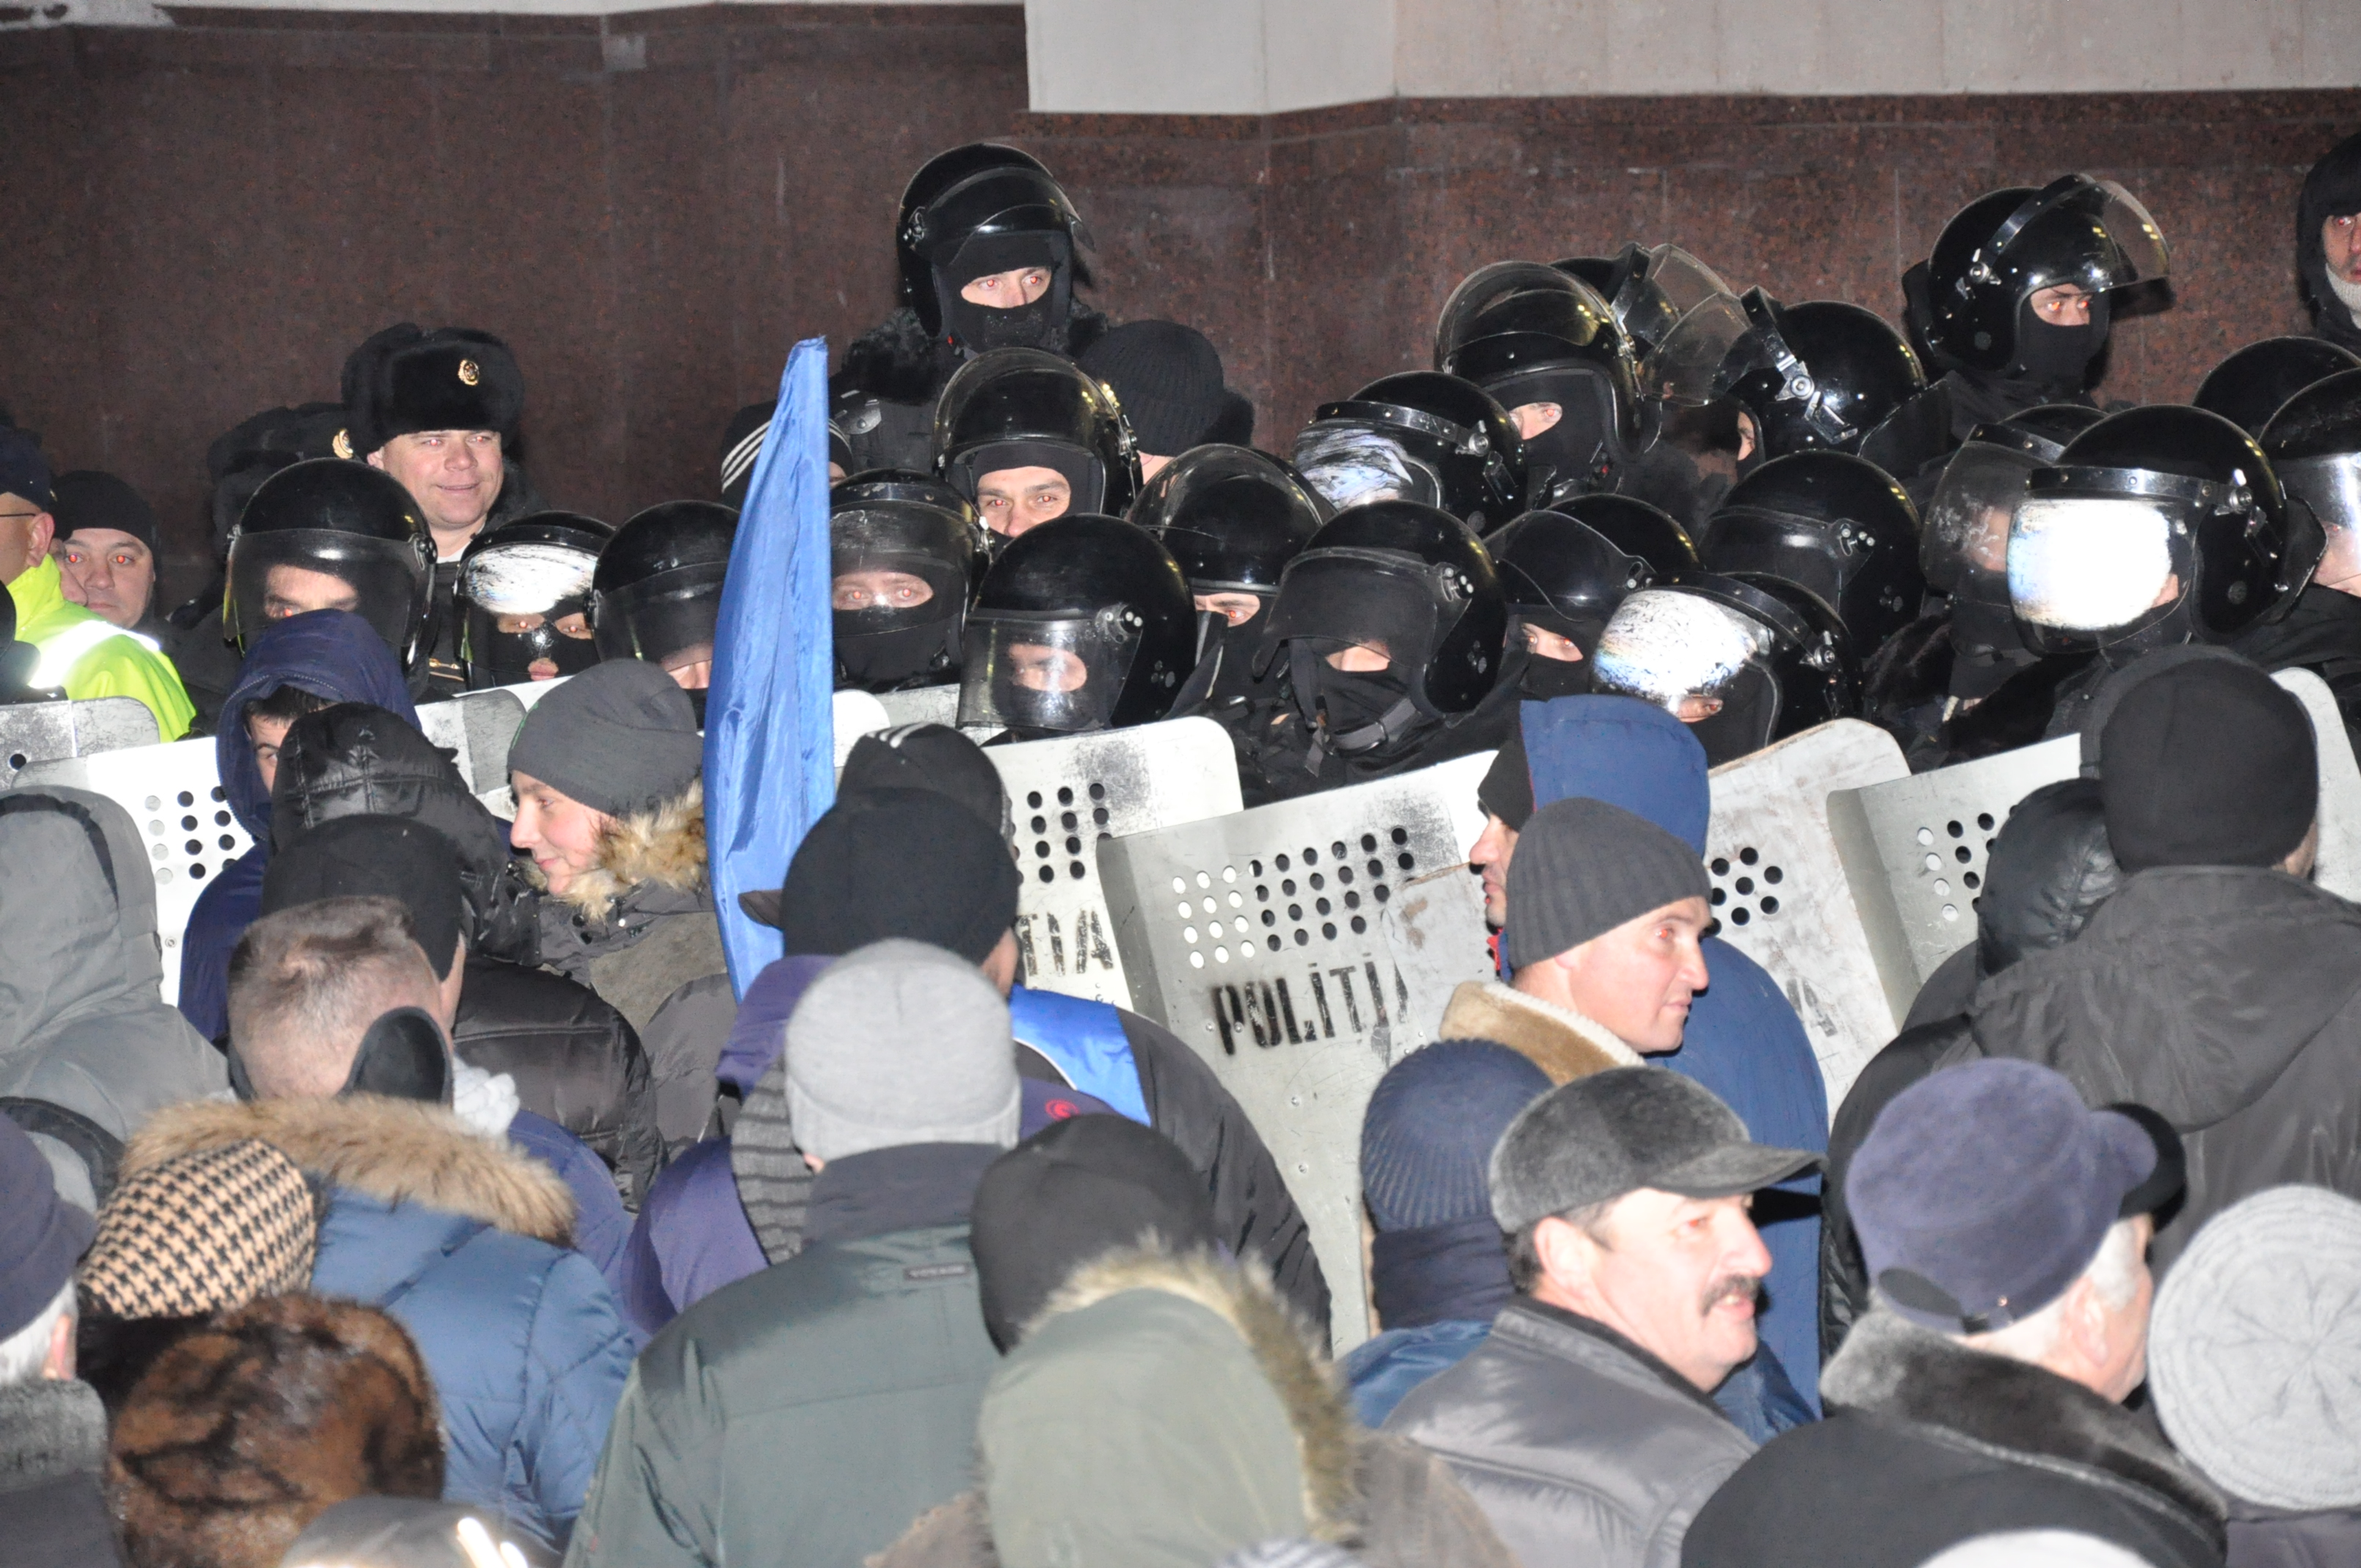 Потолкались все. У здания парламента пикетчики и полиция шли стенка на стенку. Фото: Сергей СЕДЛЕЦКИЙ